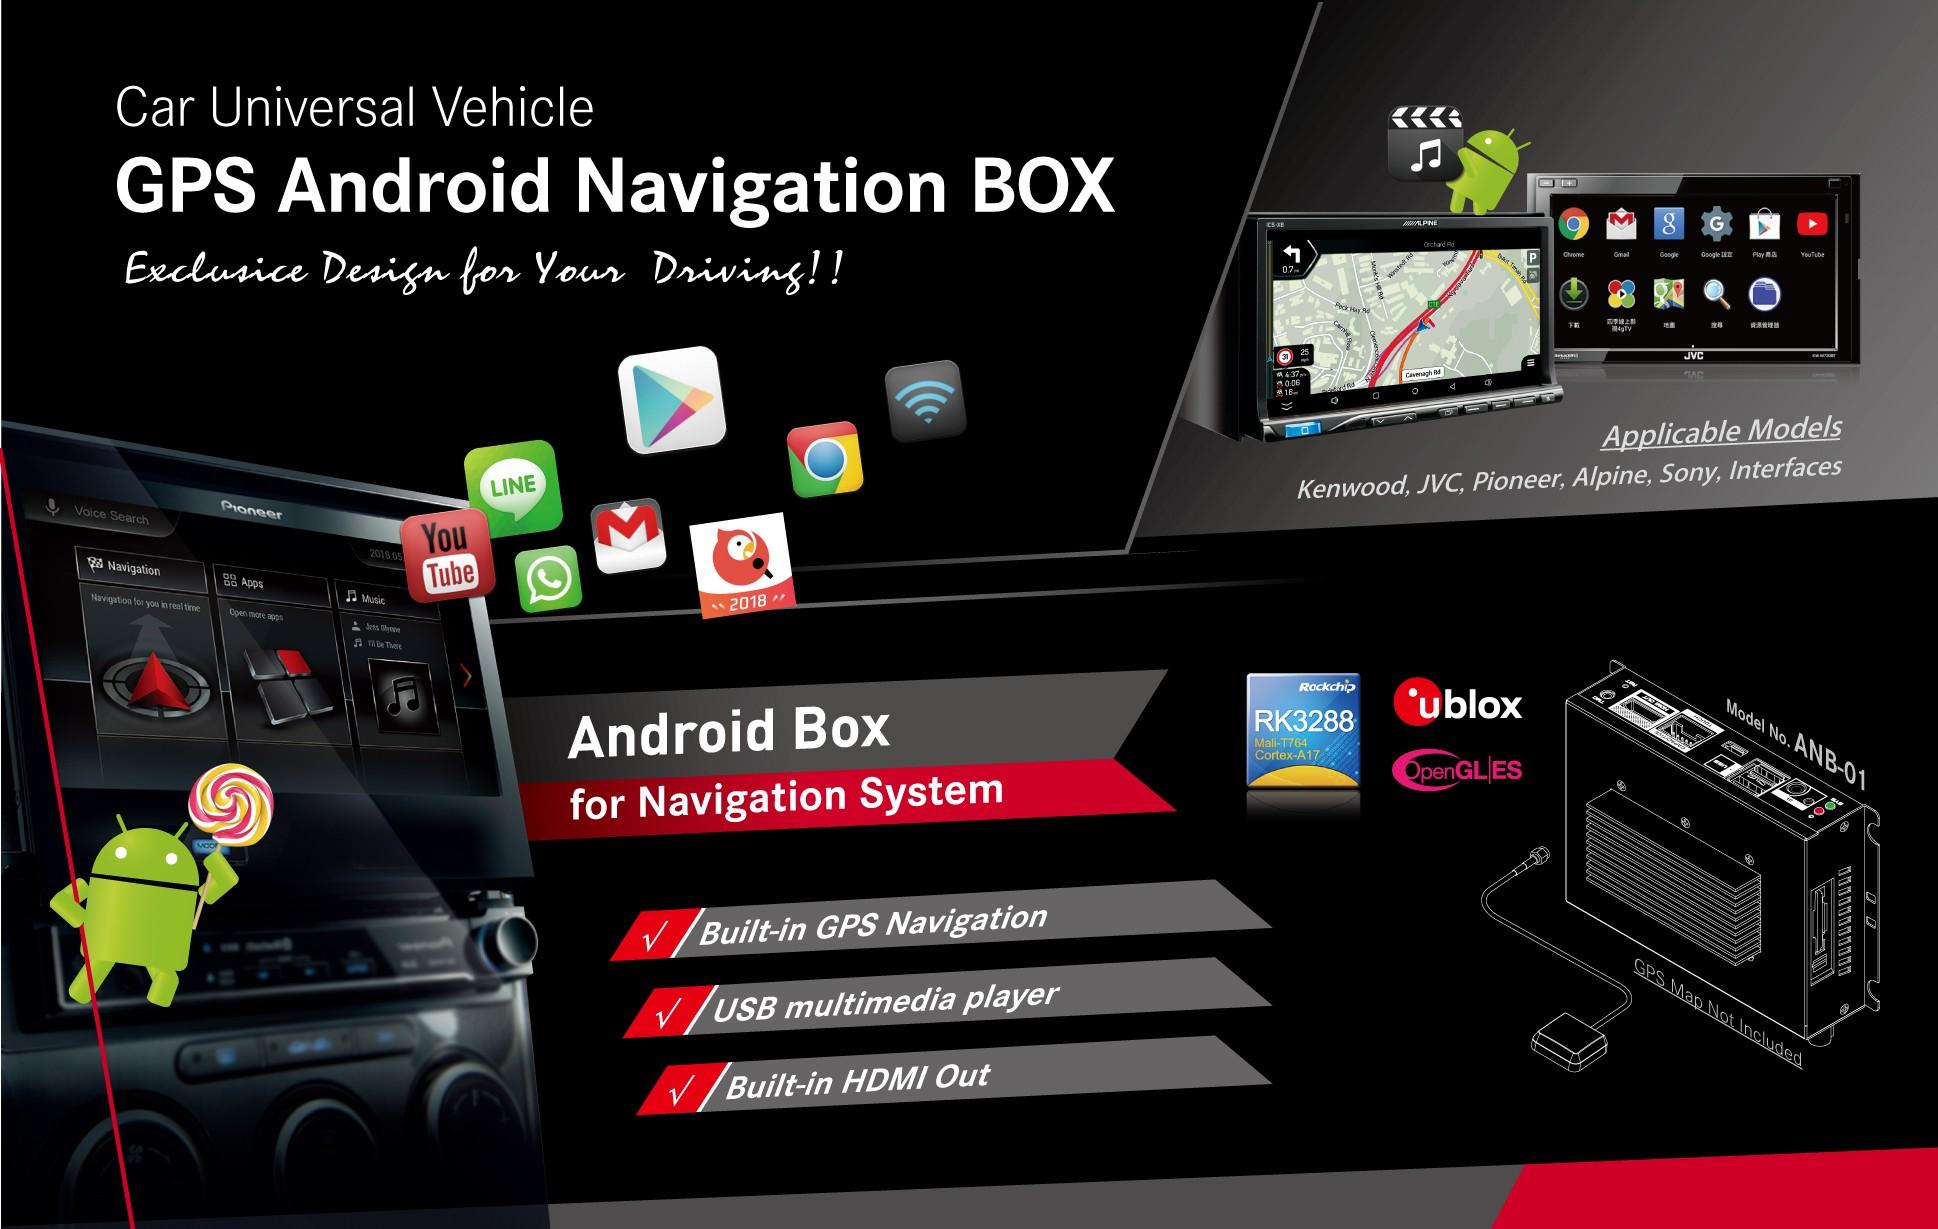 GPS Andriod Navigation Box